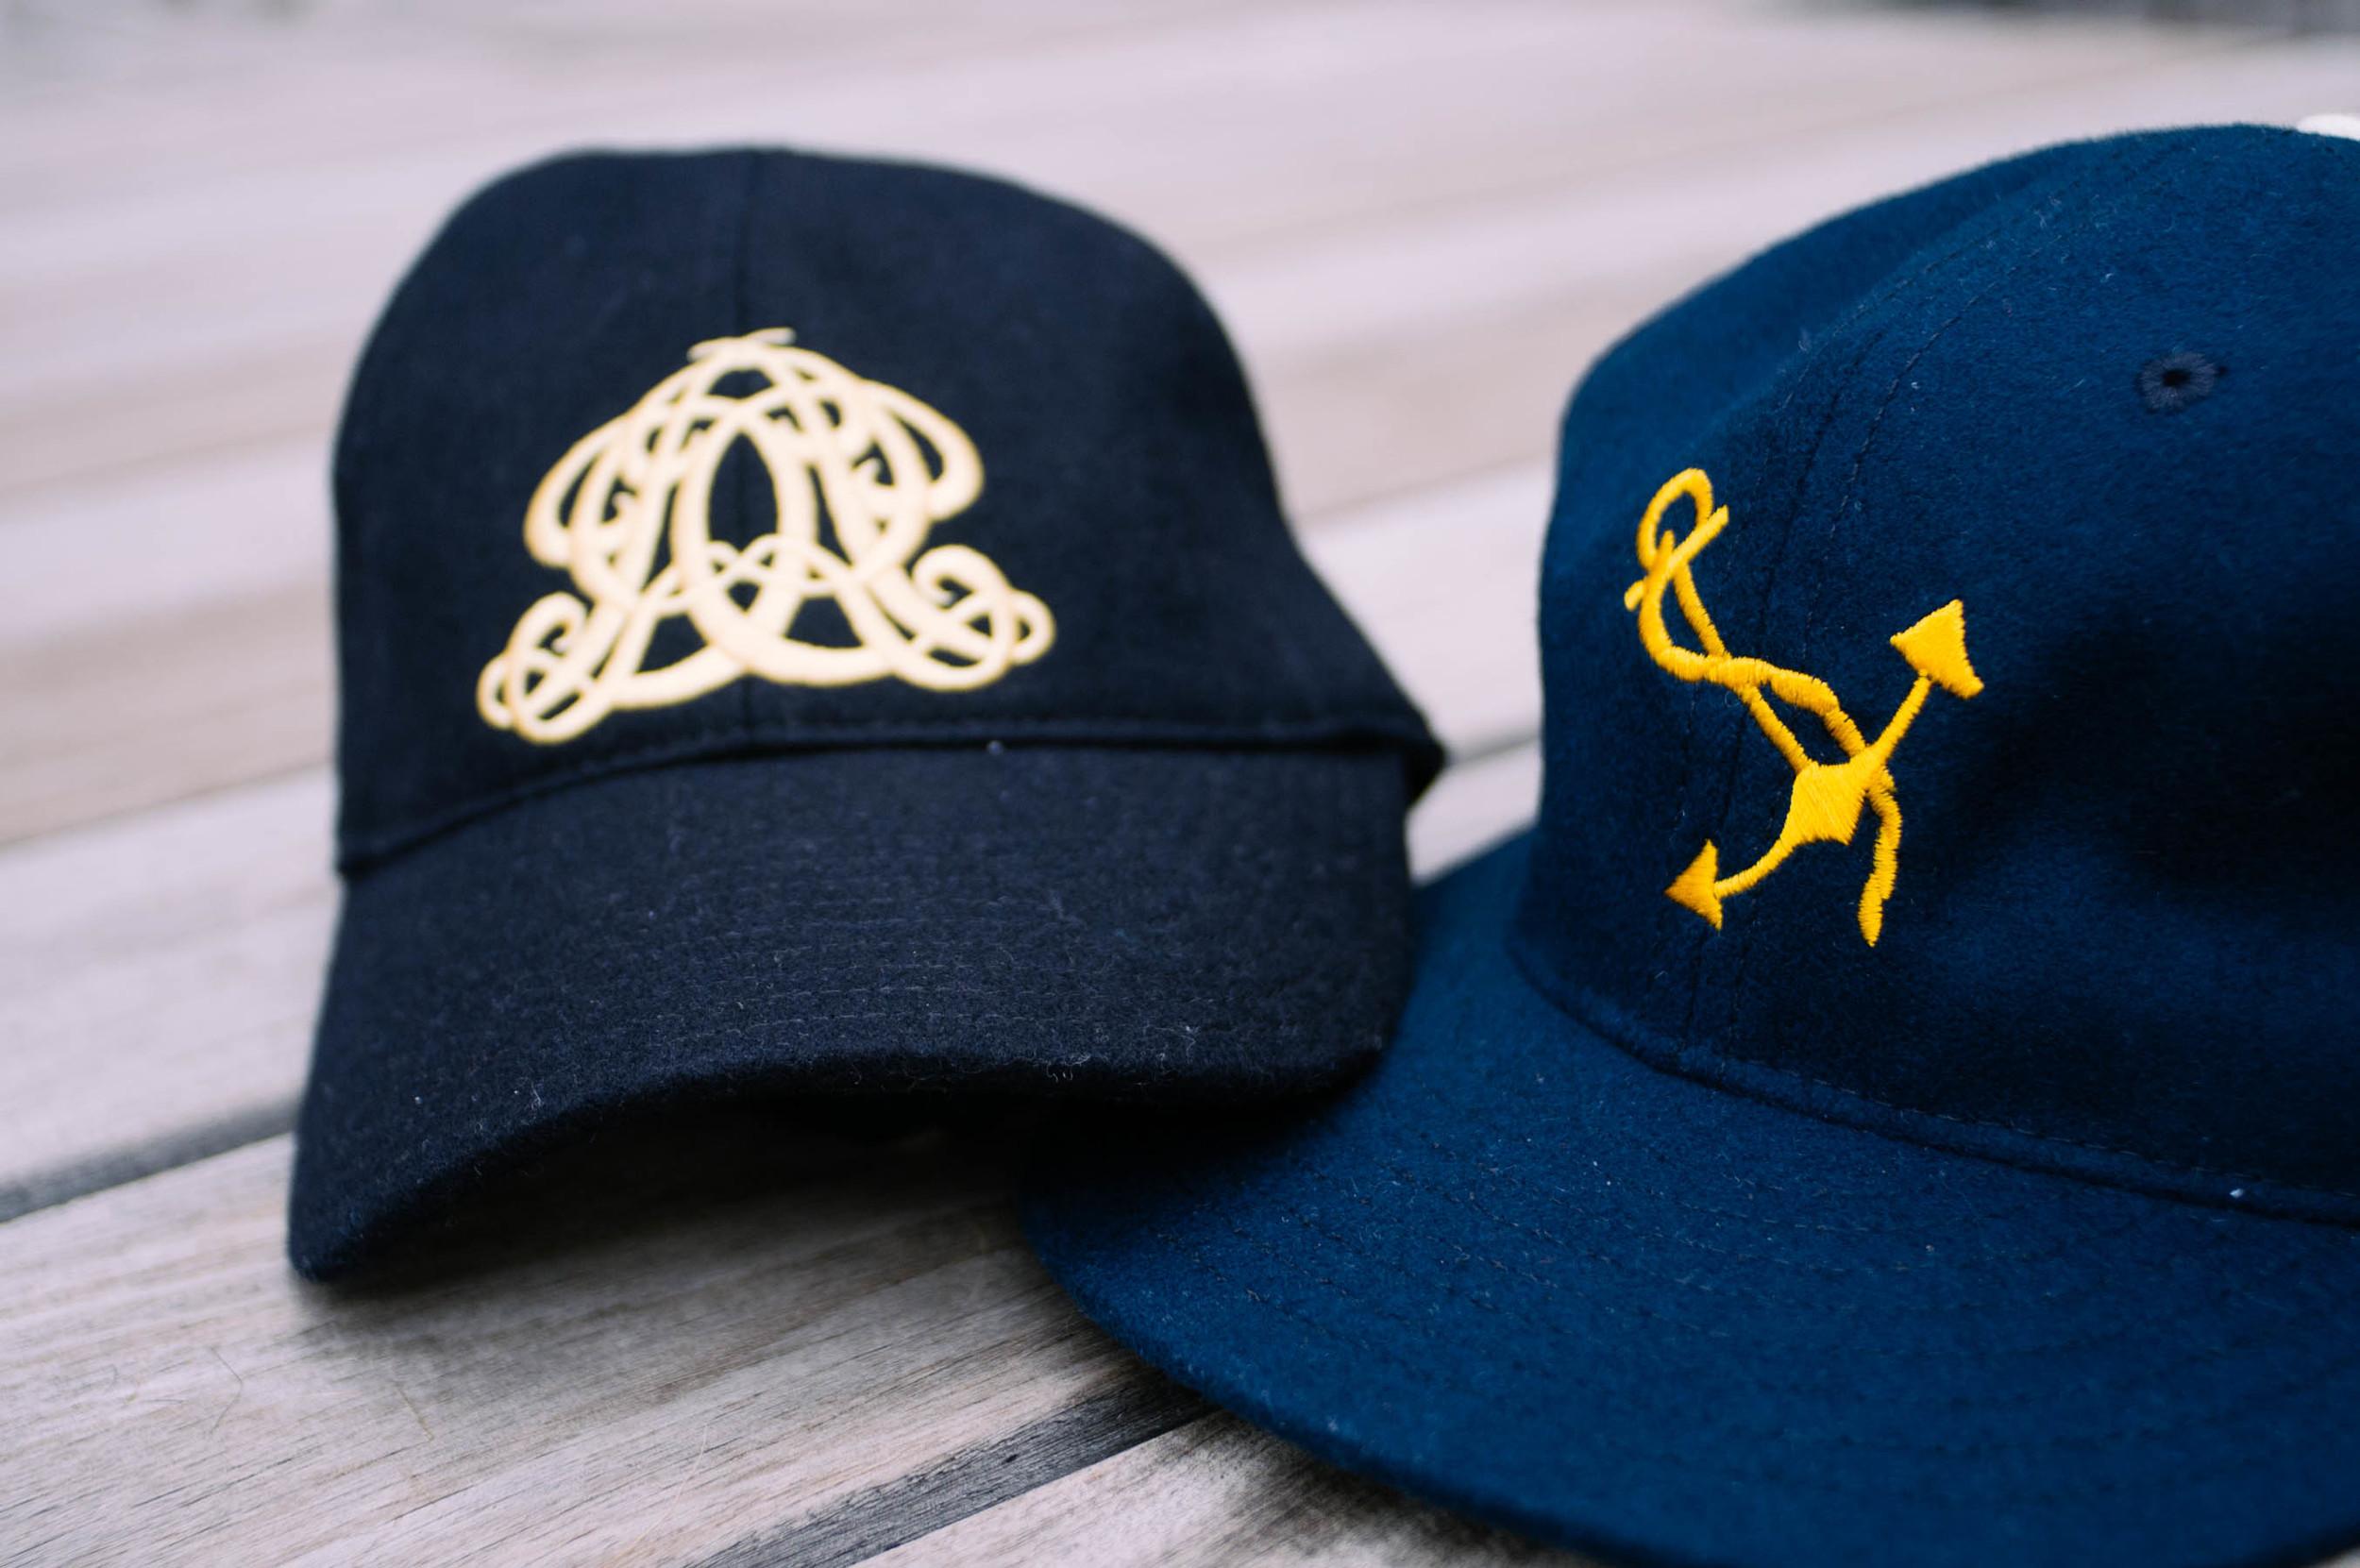 HIS (right):   Ebbets Field Flannels  baseball hat: J.Crew |  HER (left):  Embroidered emblem baseball hat: J.Crew